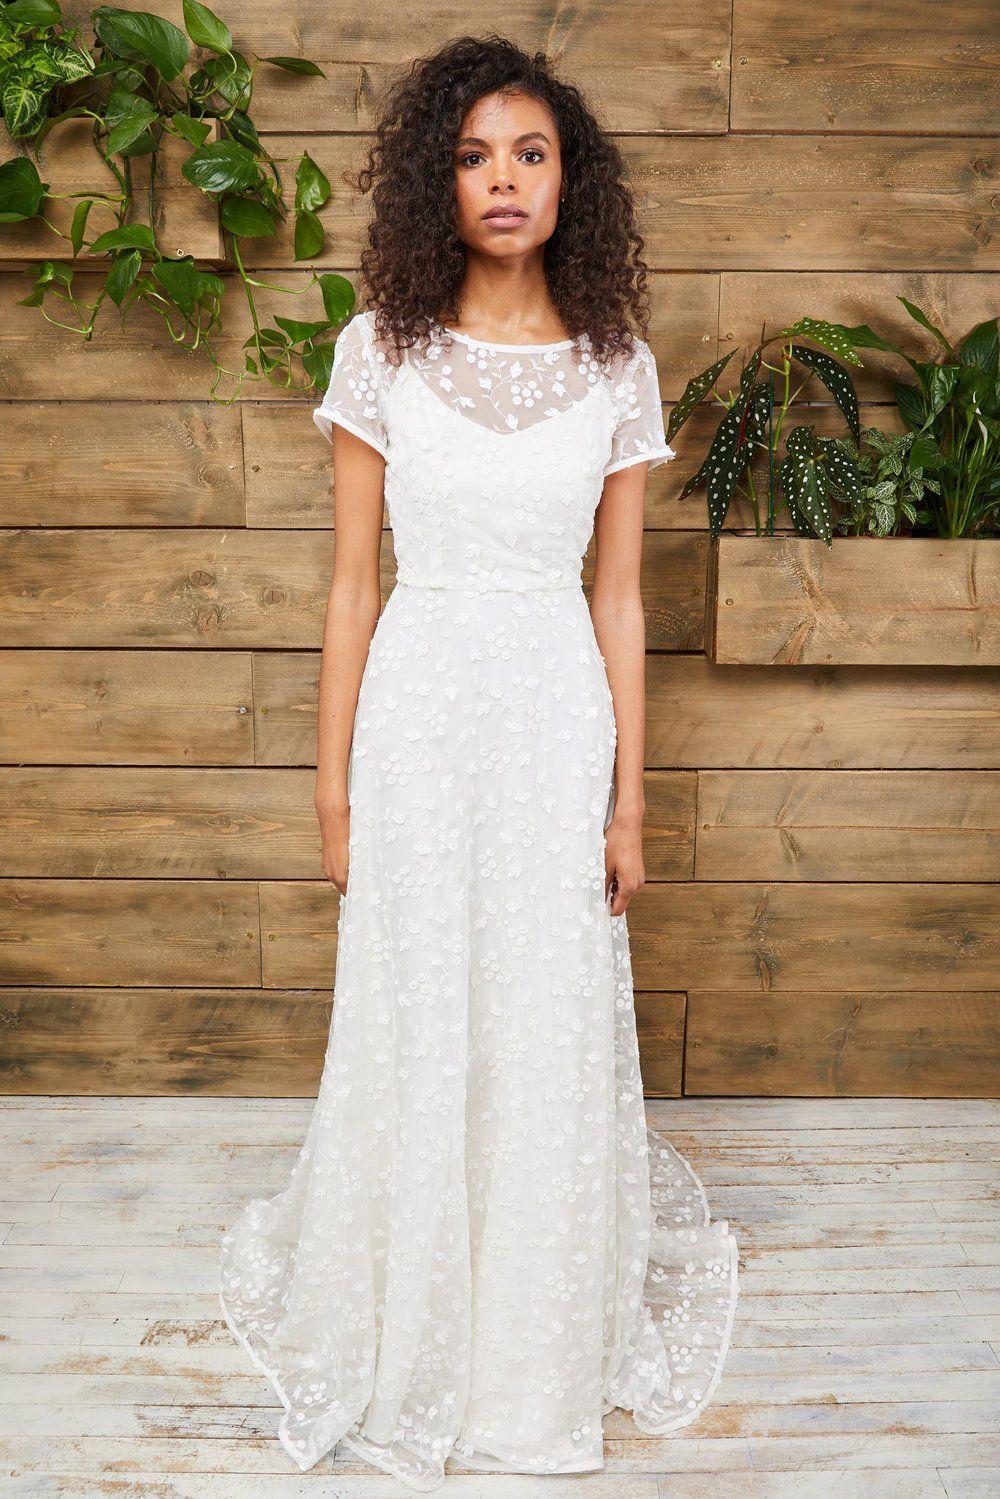 Dresses in 2020 Casual wedding dress, Wedding dress blog